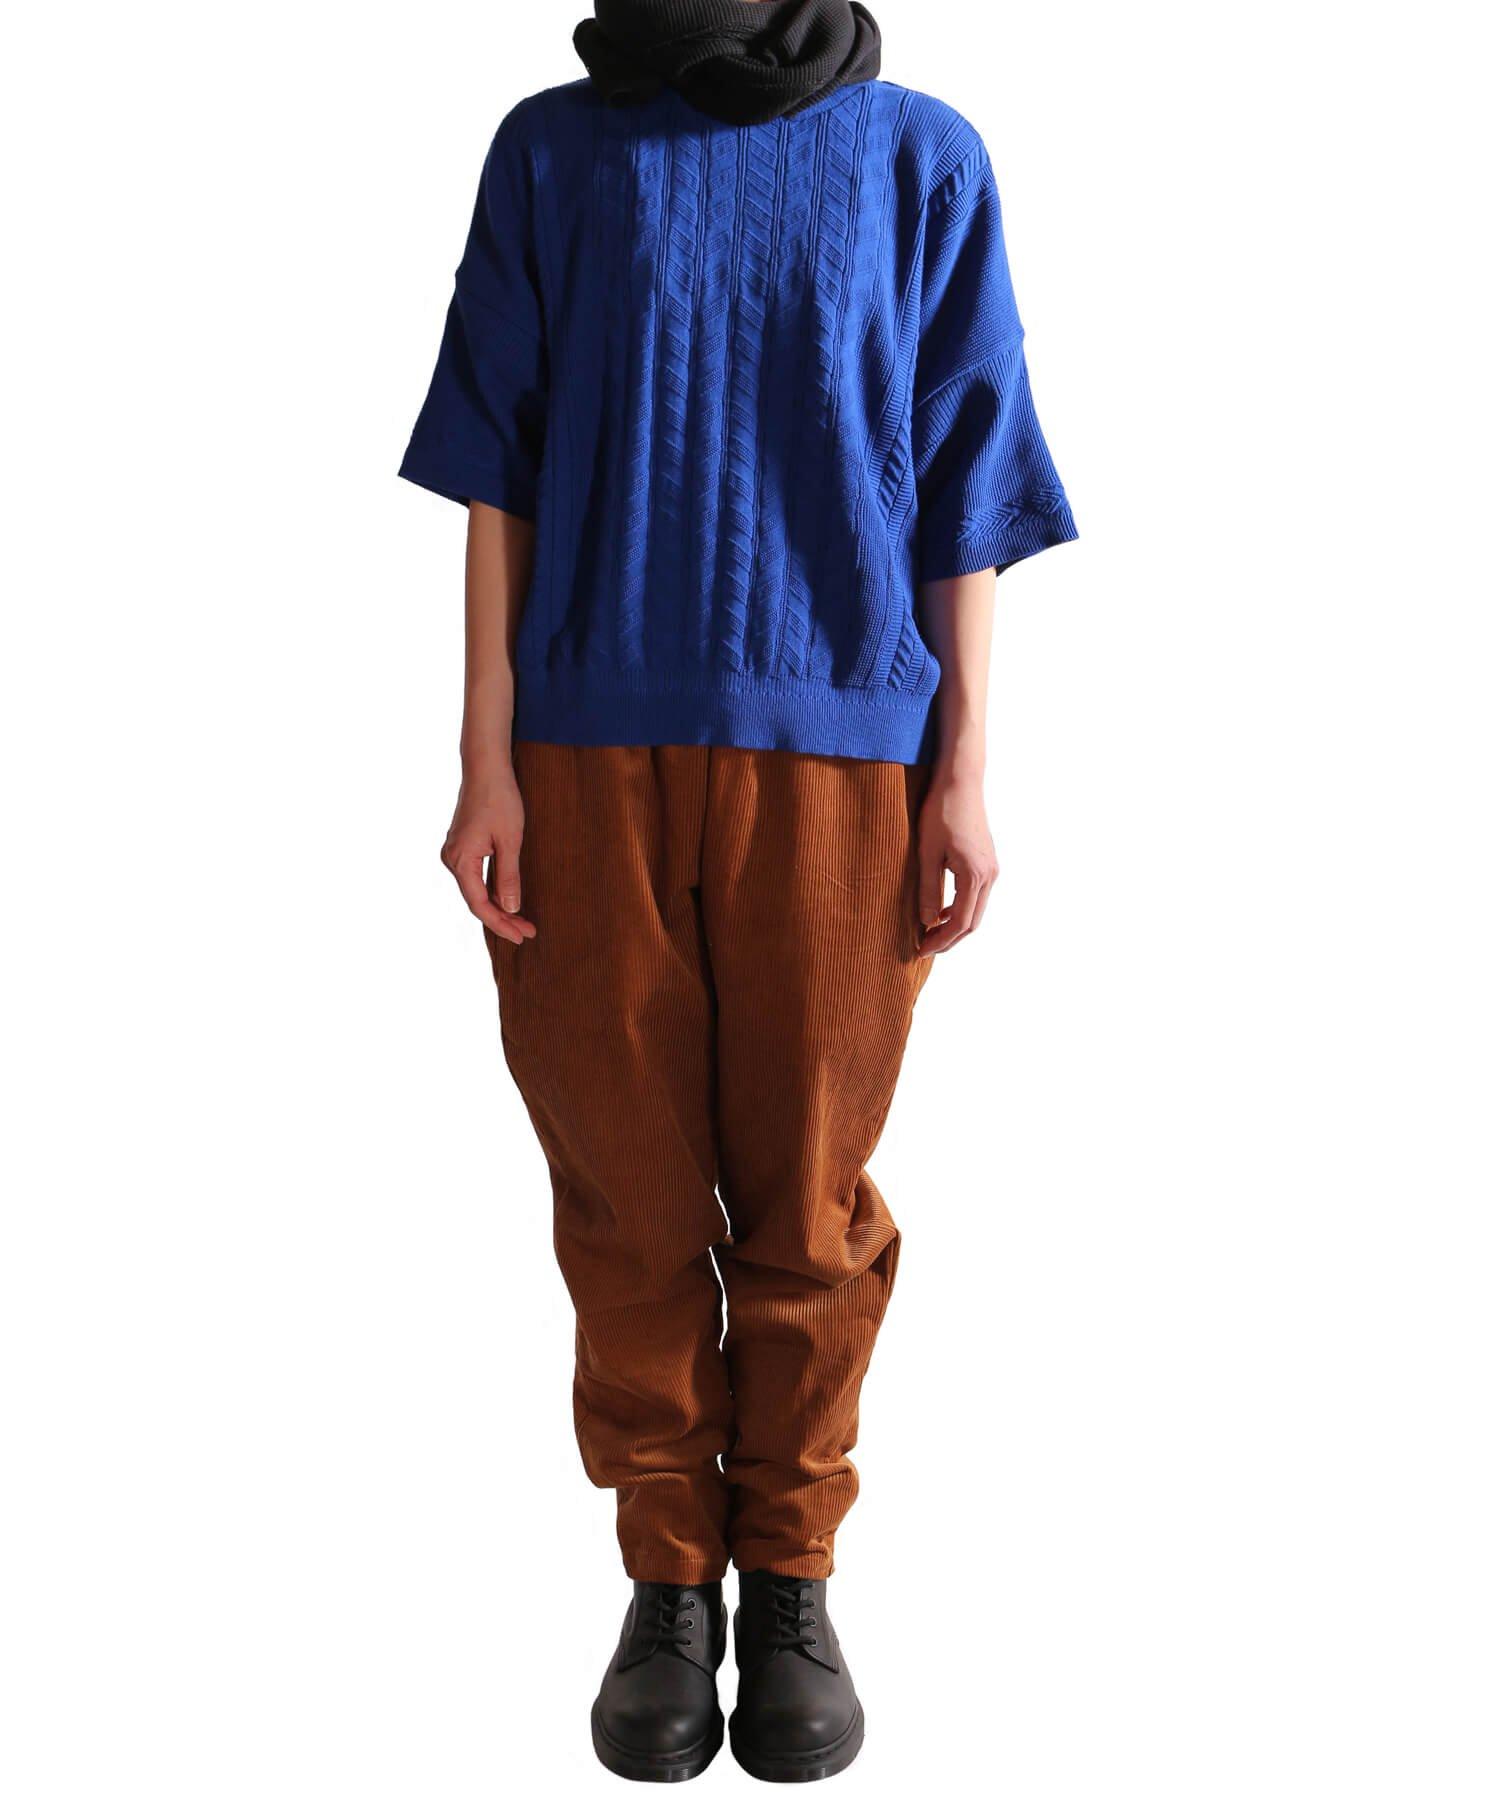 YASHIKI / ヤシキ |YASHIKI / ヤシキ × SIDEMILITIA inc. / サイドミリティア  RYUREI KNIT (LIMITED BLUE/WOMEN'S) 商品画像11